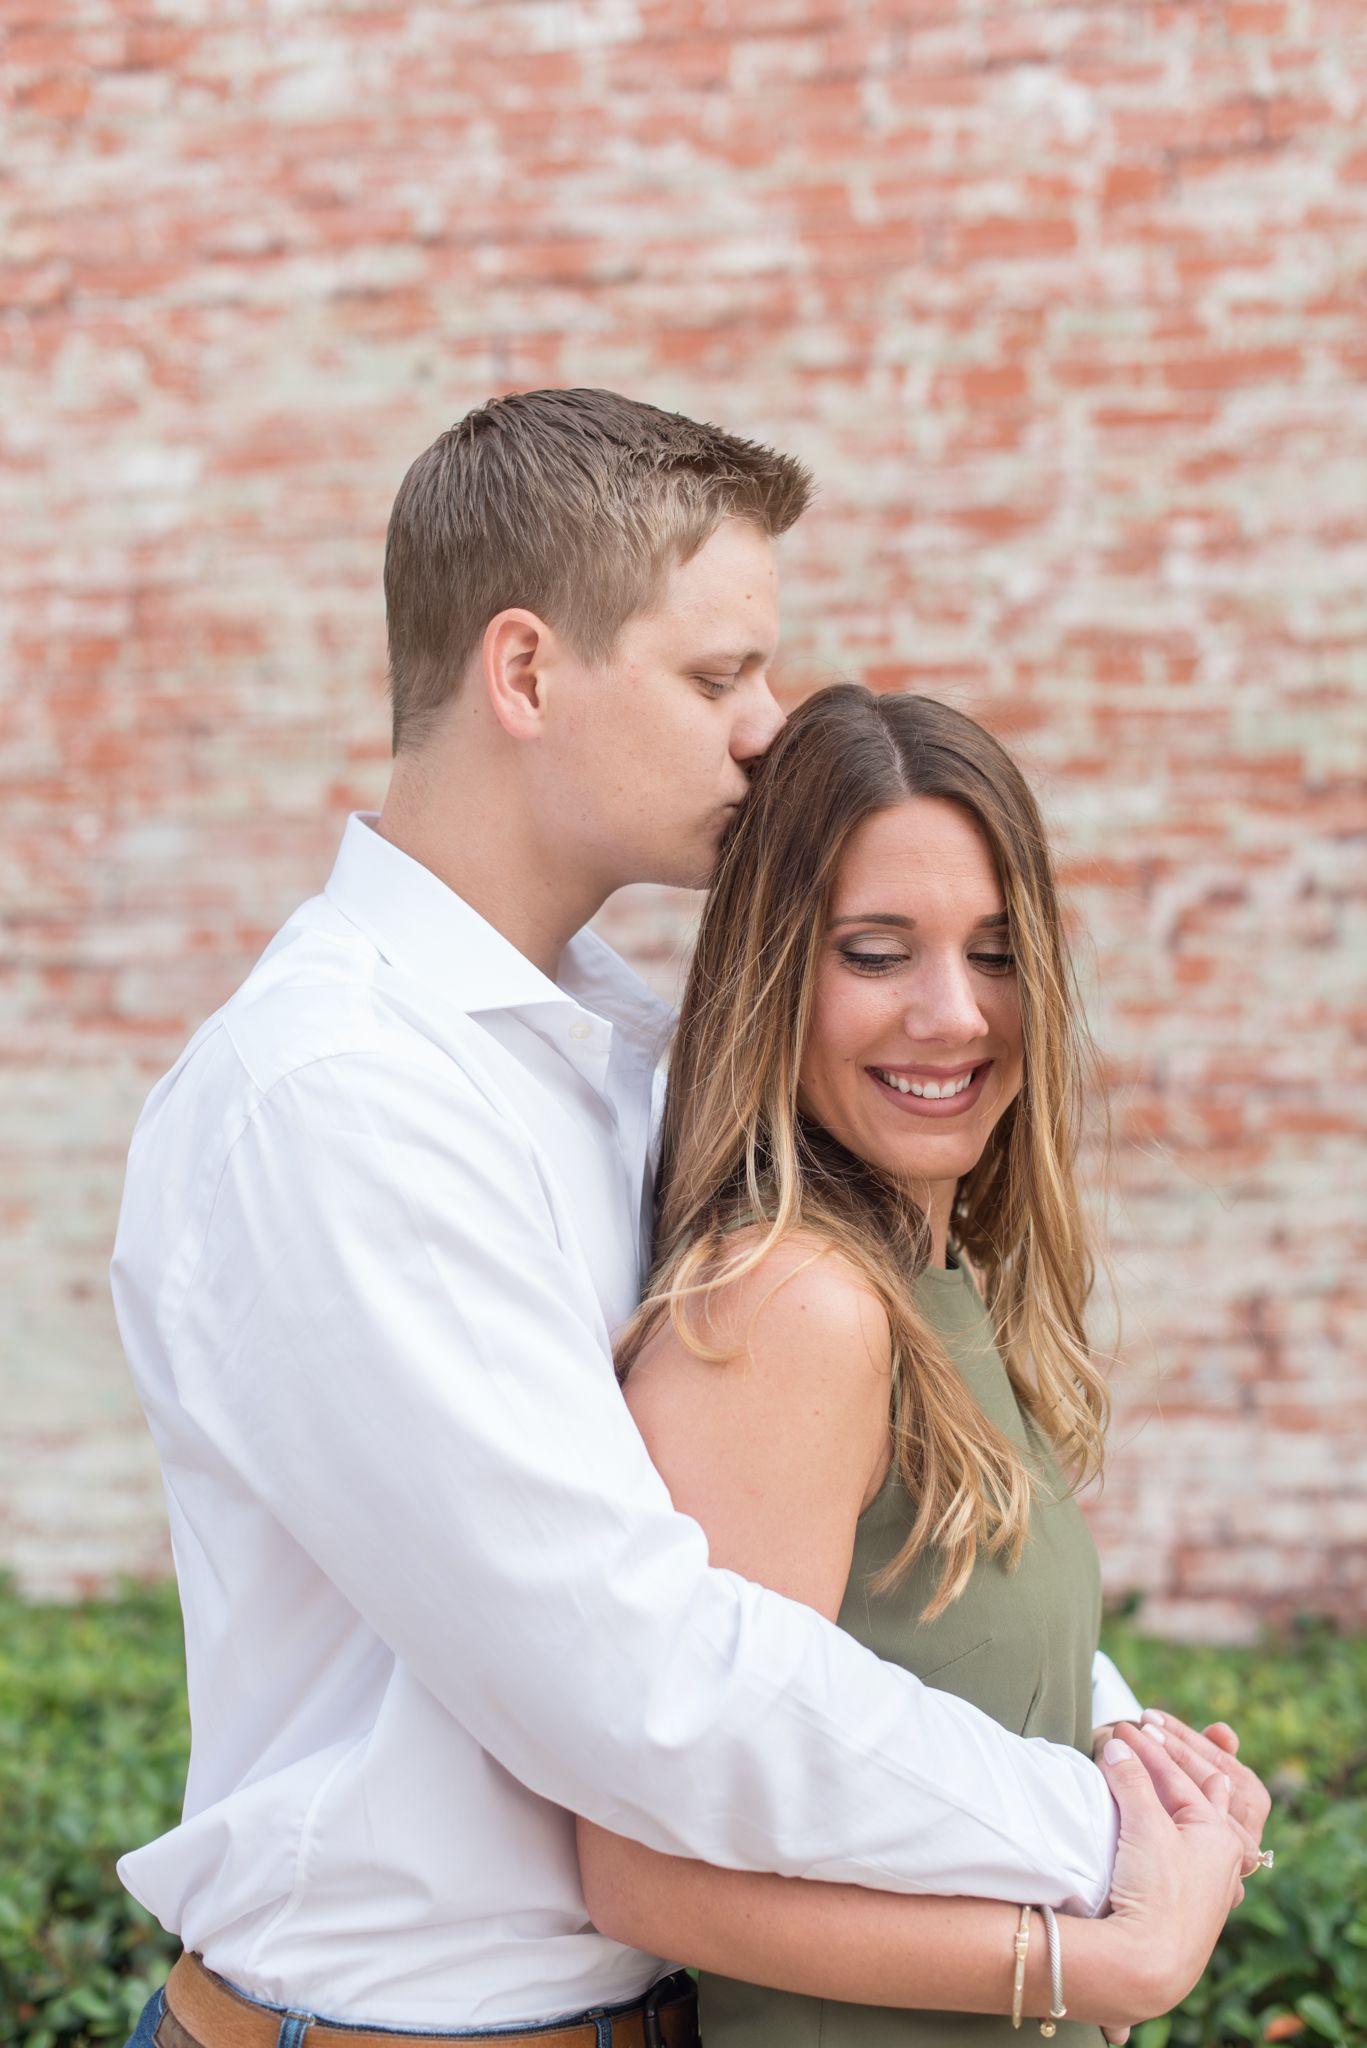 Vermont online dating